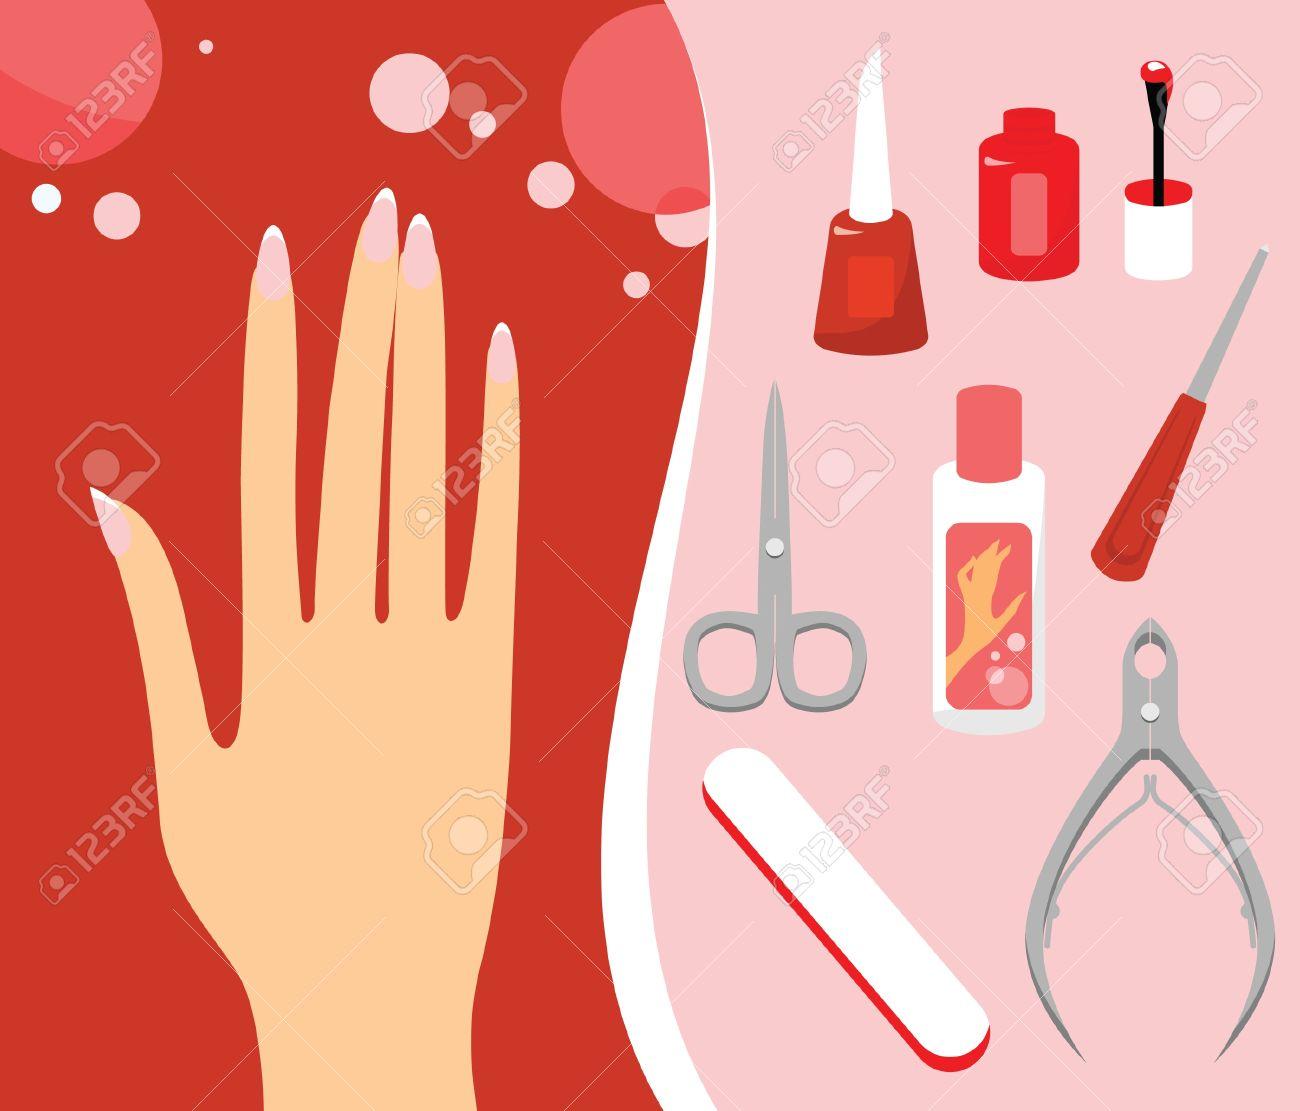 Manicure clip art.